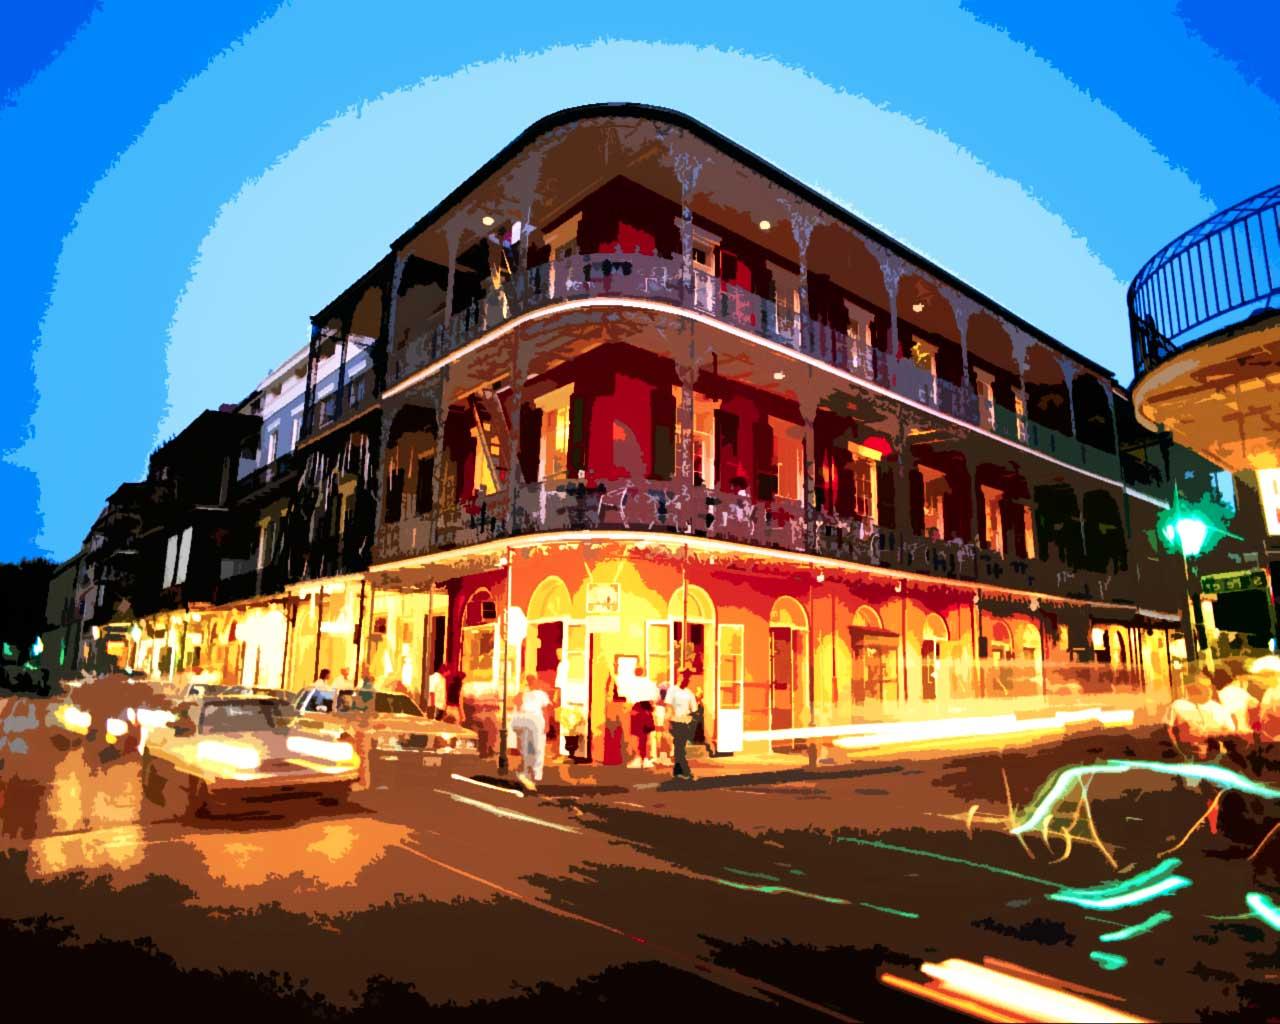 New Orleans Locals Evaluate eCigarettes